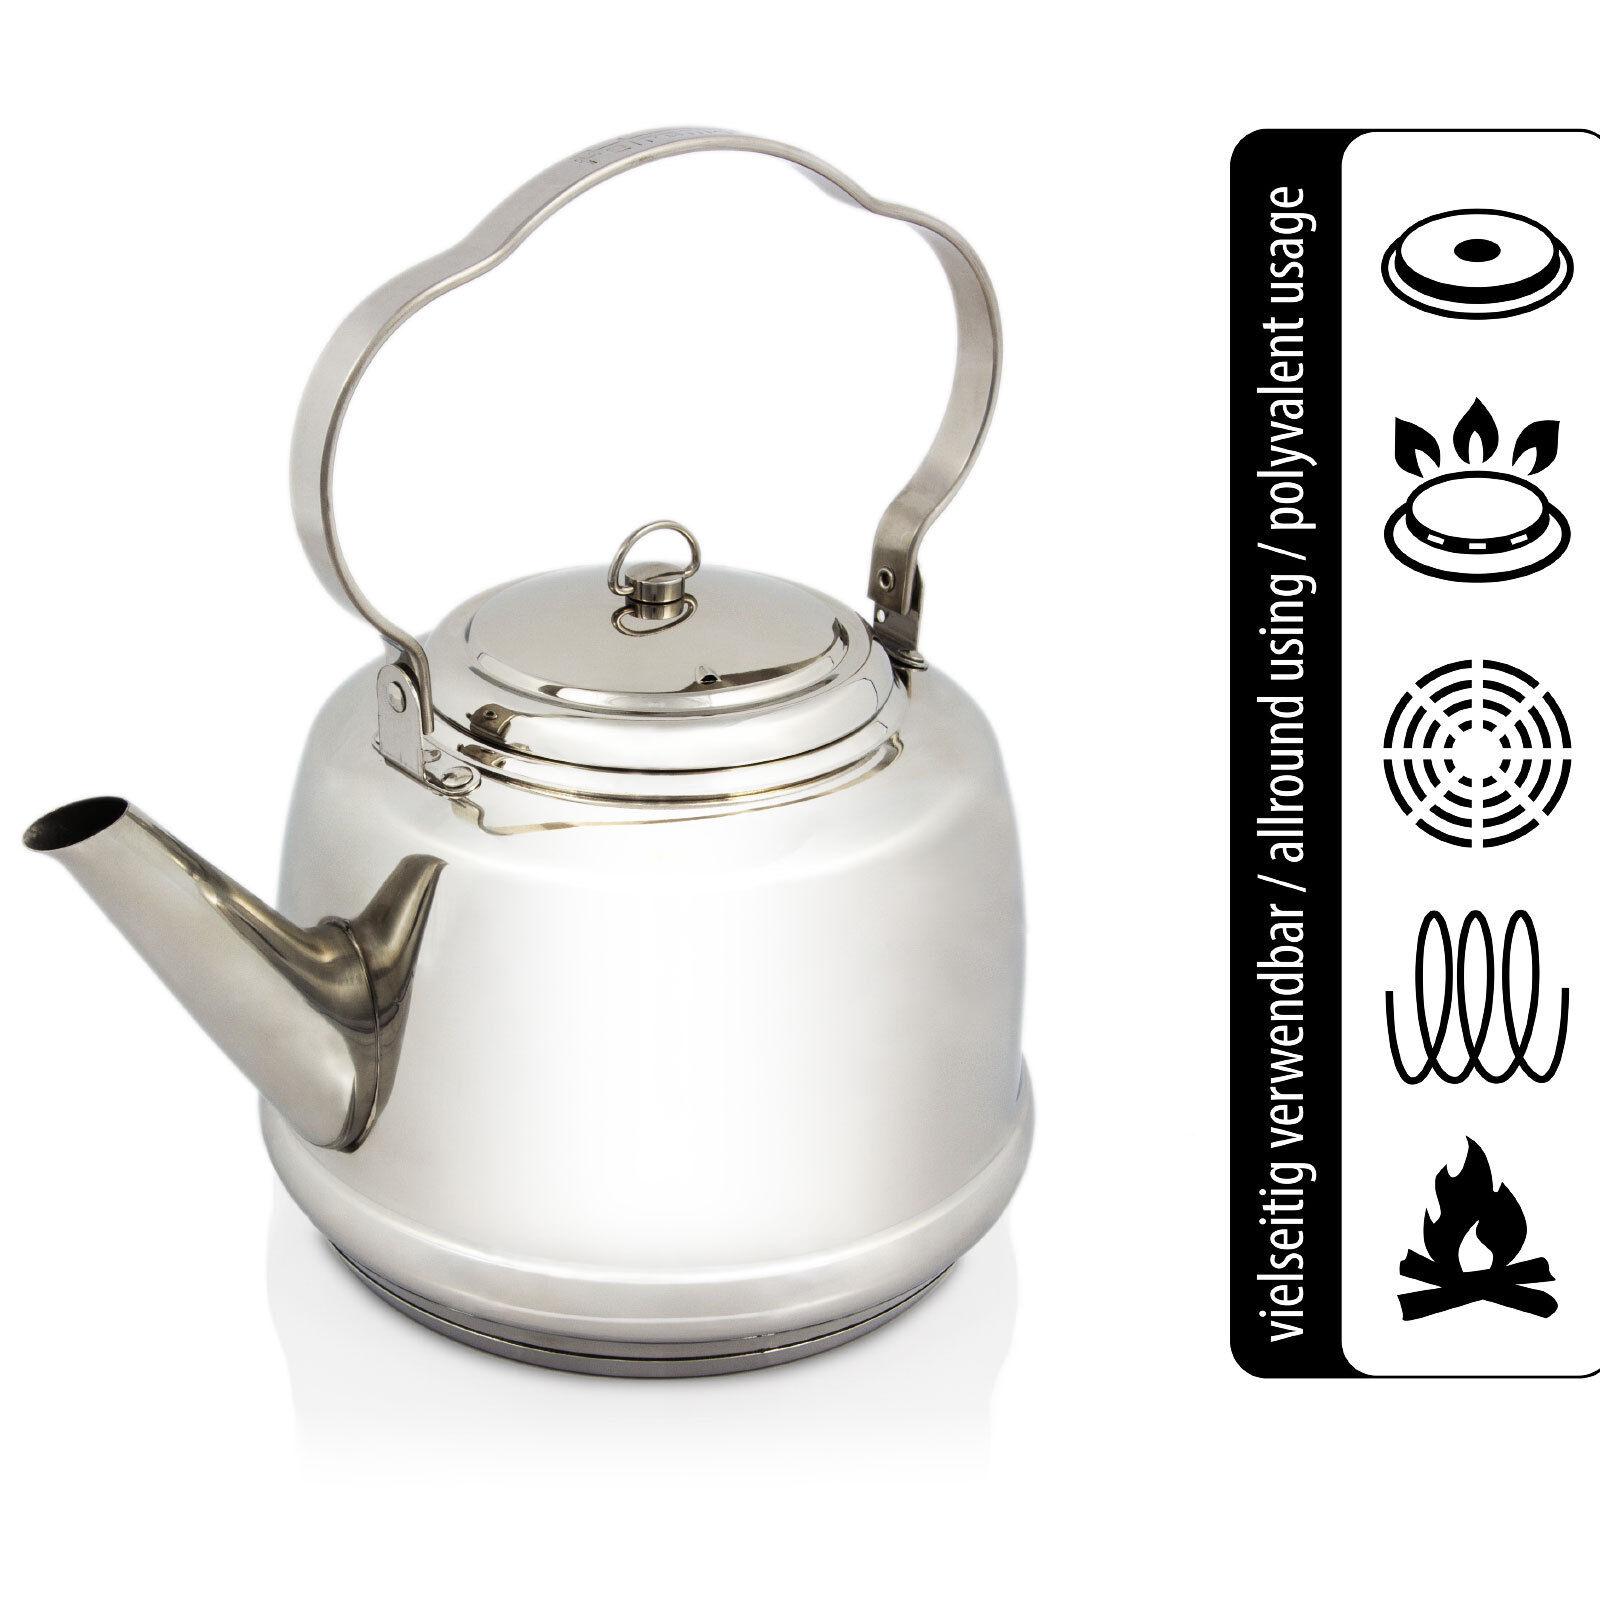 Teekanne Edelstahl Petromax Edelstahl Teekanne Teekessel Camping Wasserkessel Wasserkocher tk1 1,5L b4ba84